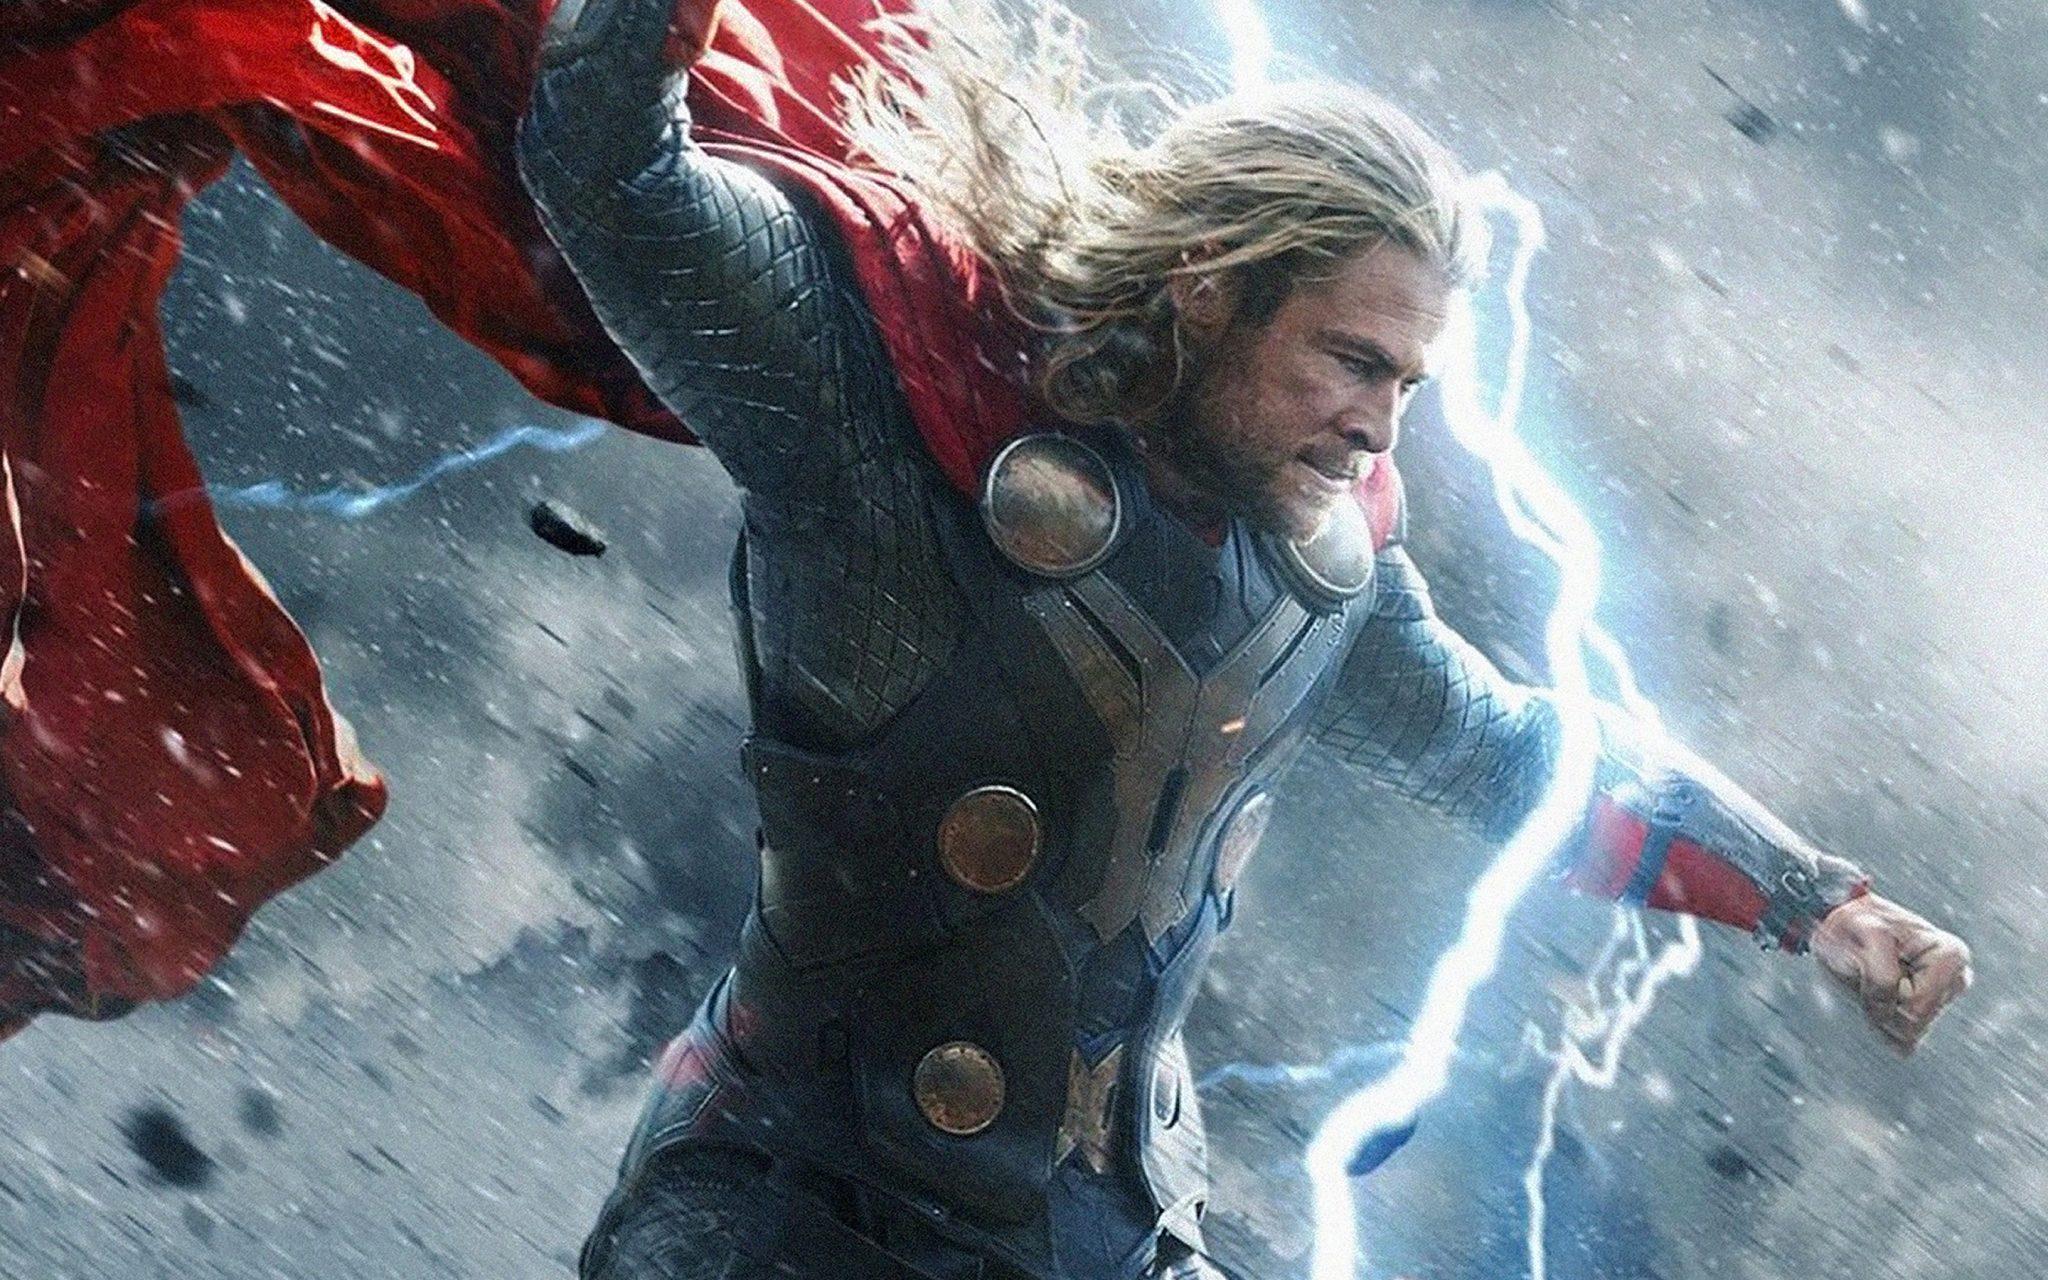 hinh-anh-sieu-anh-hung-the-avengers-Super-hero-1